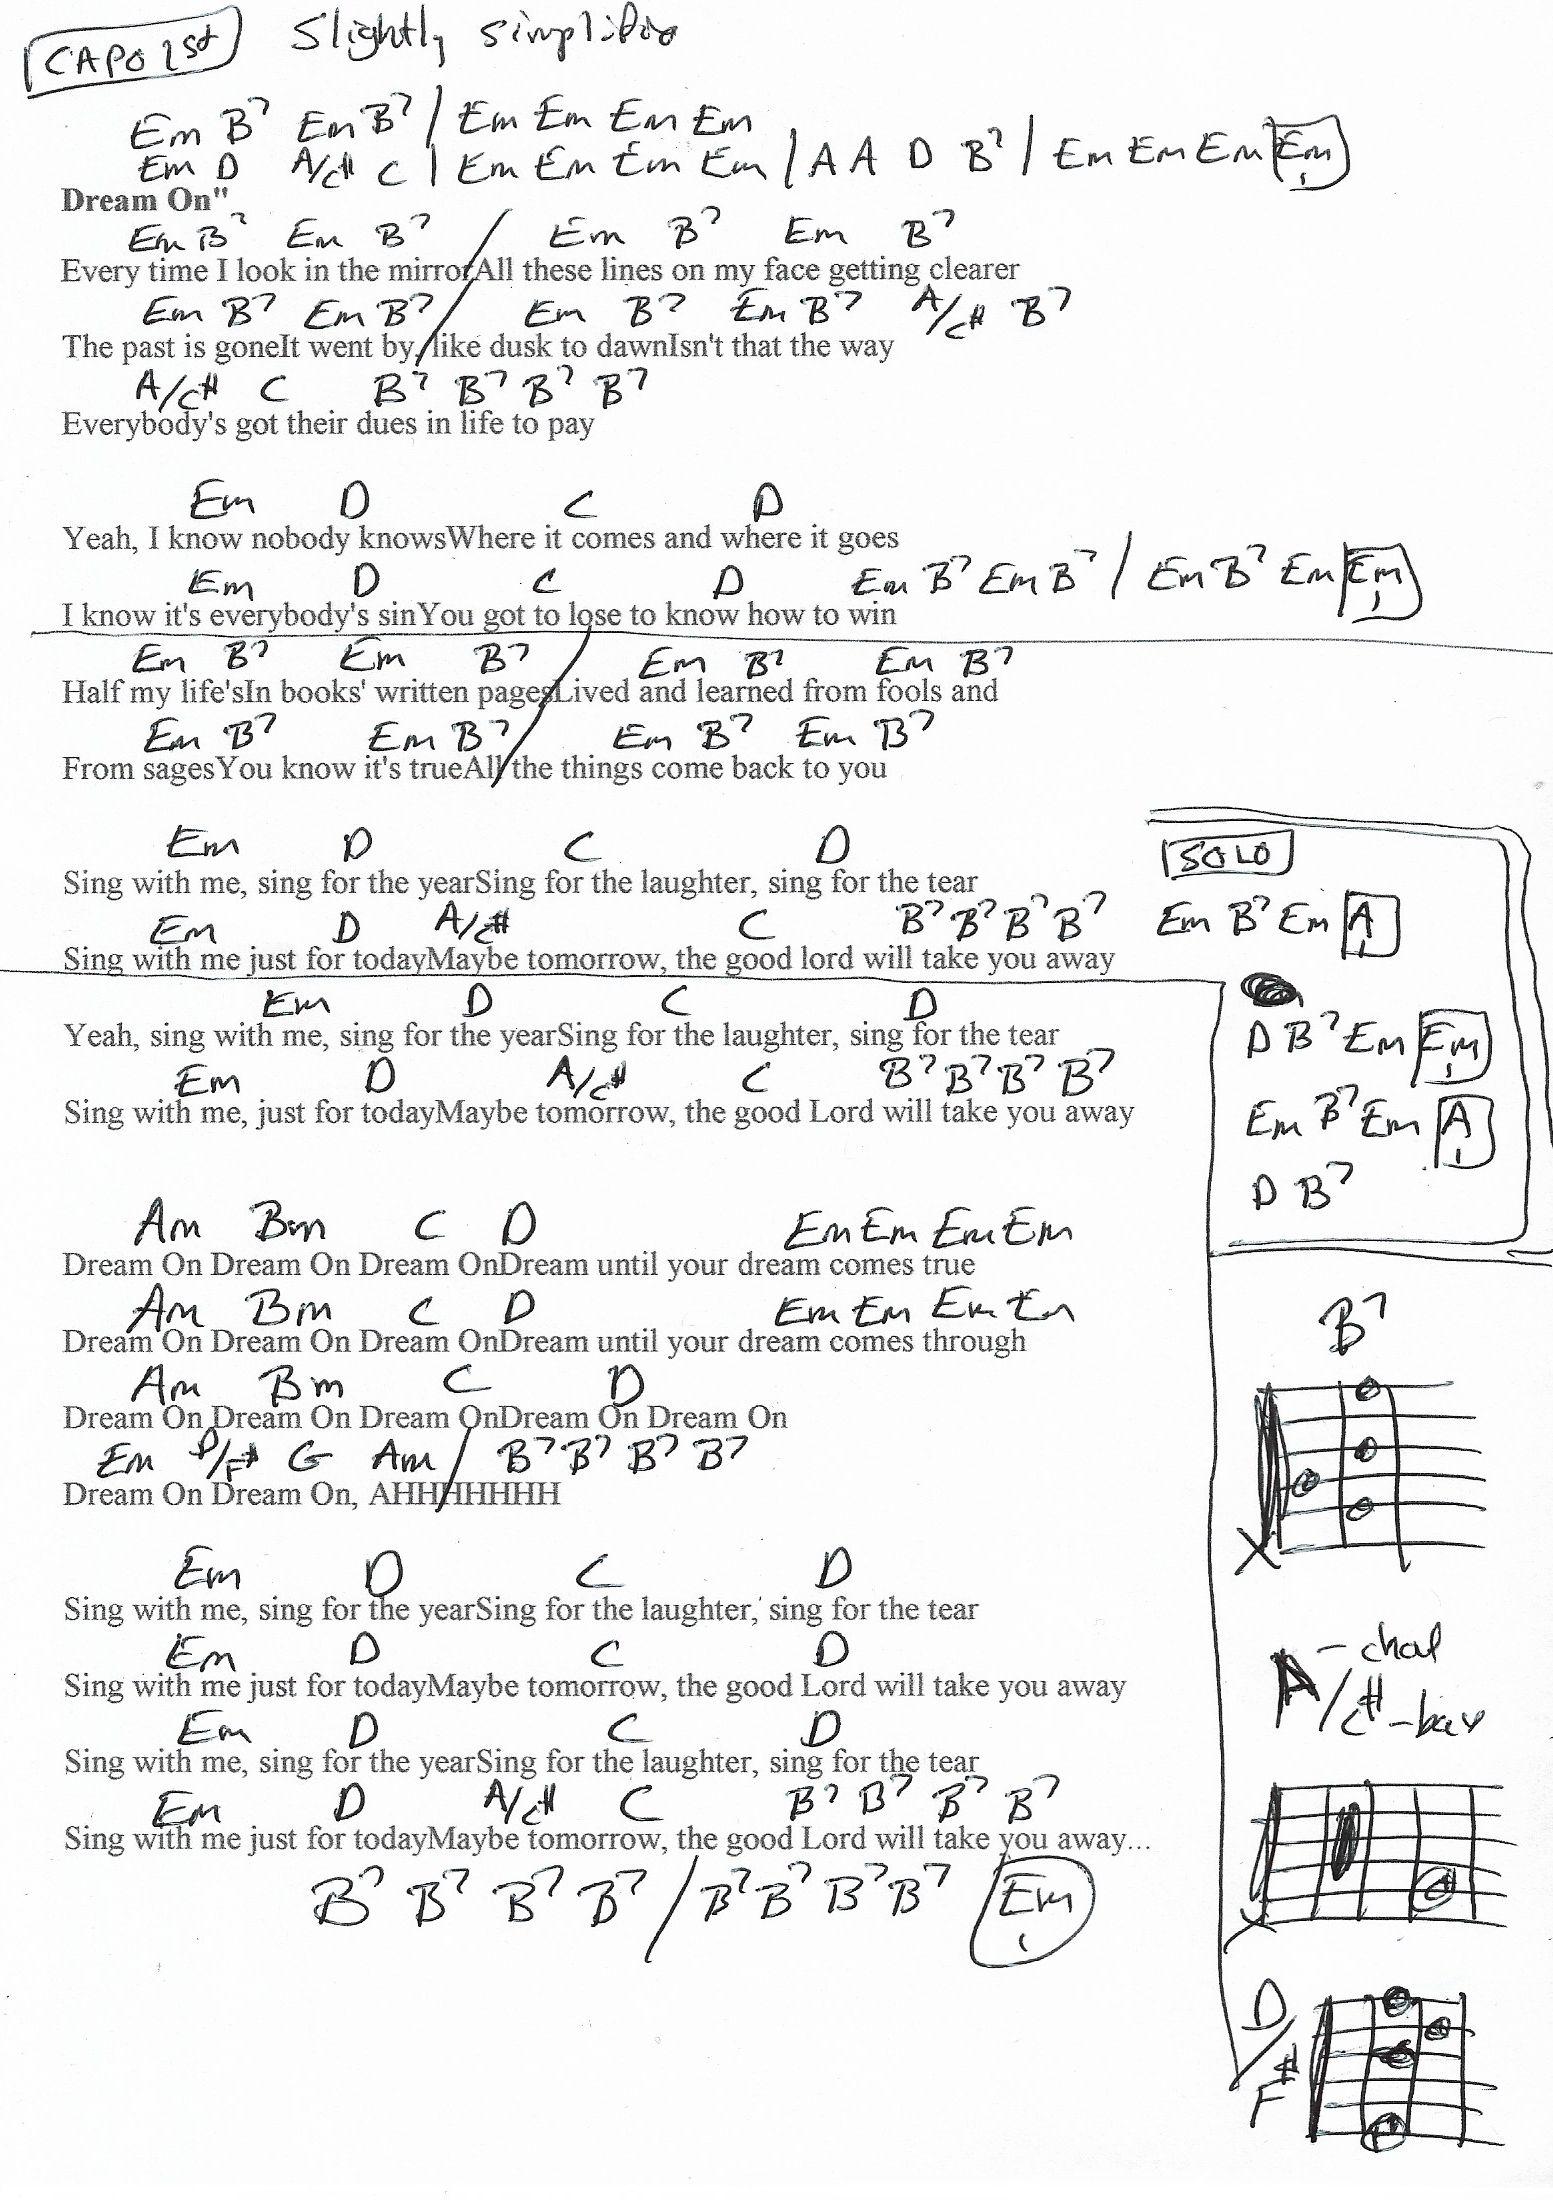 Dream On Aerosmith Guitar Chord Chart   Capo 15st   Simplified ...